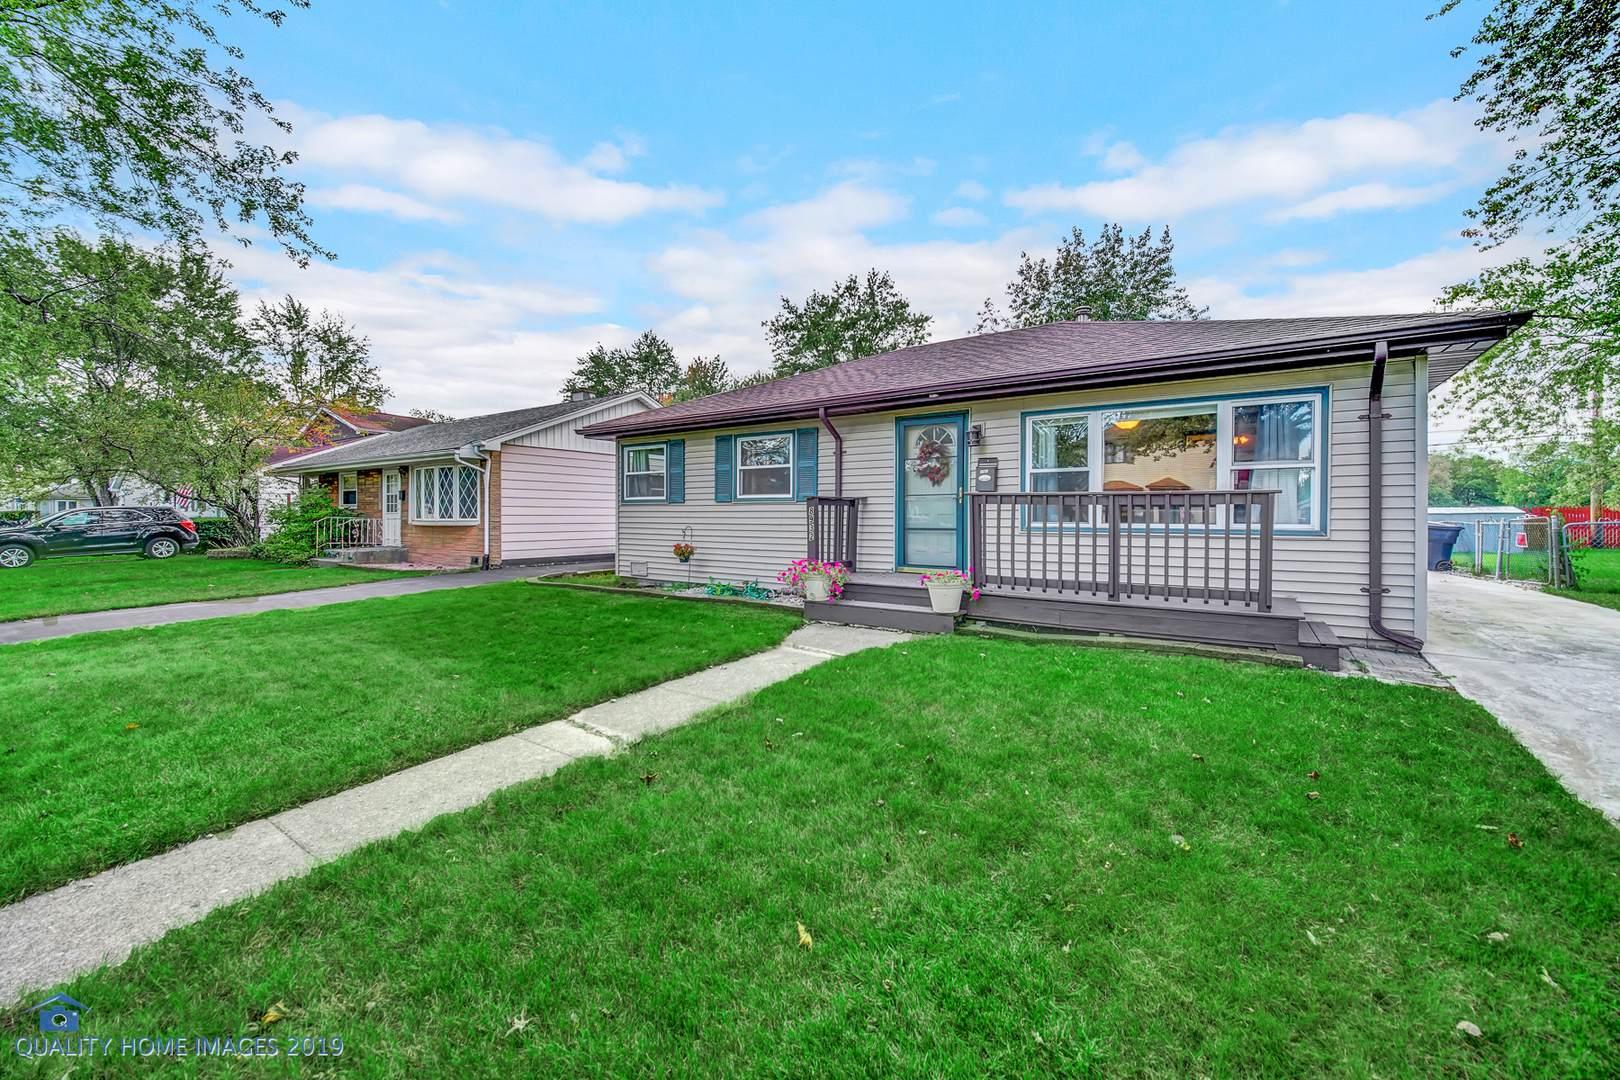 8932 S 51st Avenue, Oak Lawn, IL 60453 (MLS #10554253) :: The Wexler Group at Keller Williams Preferred Realty